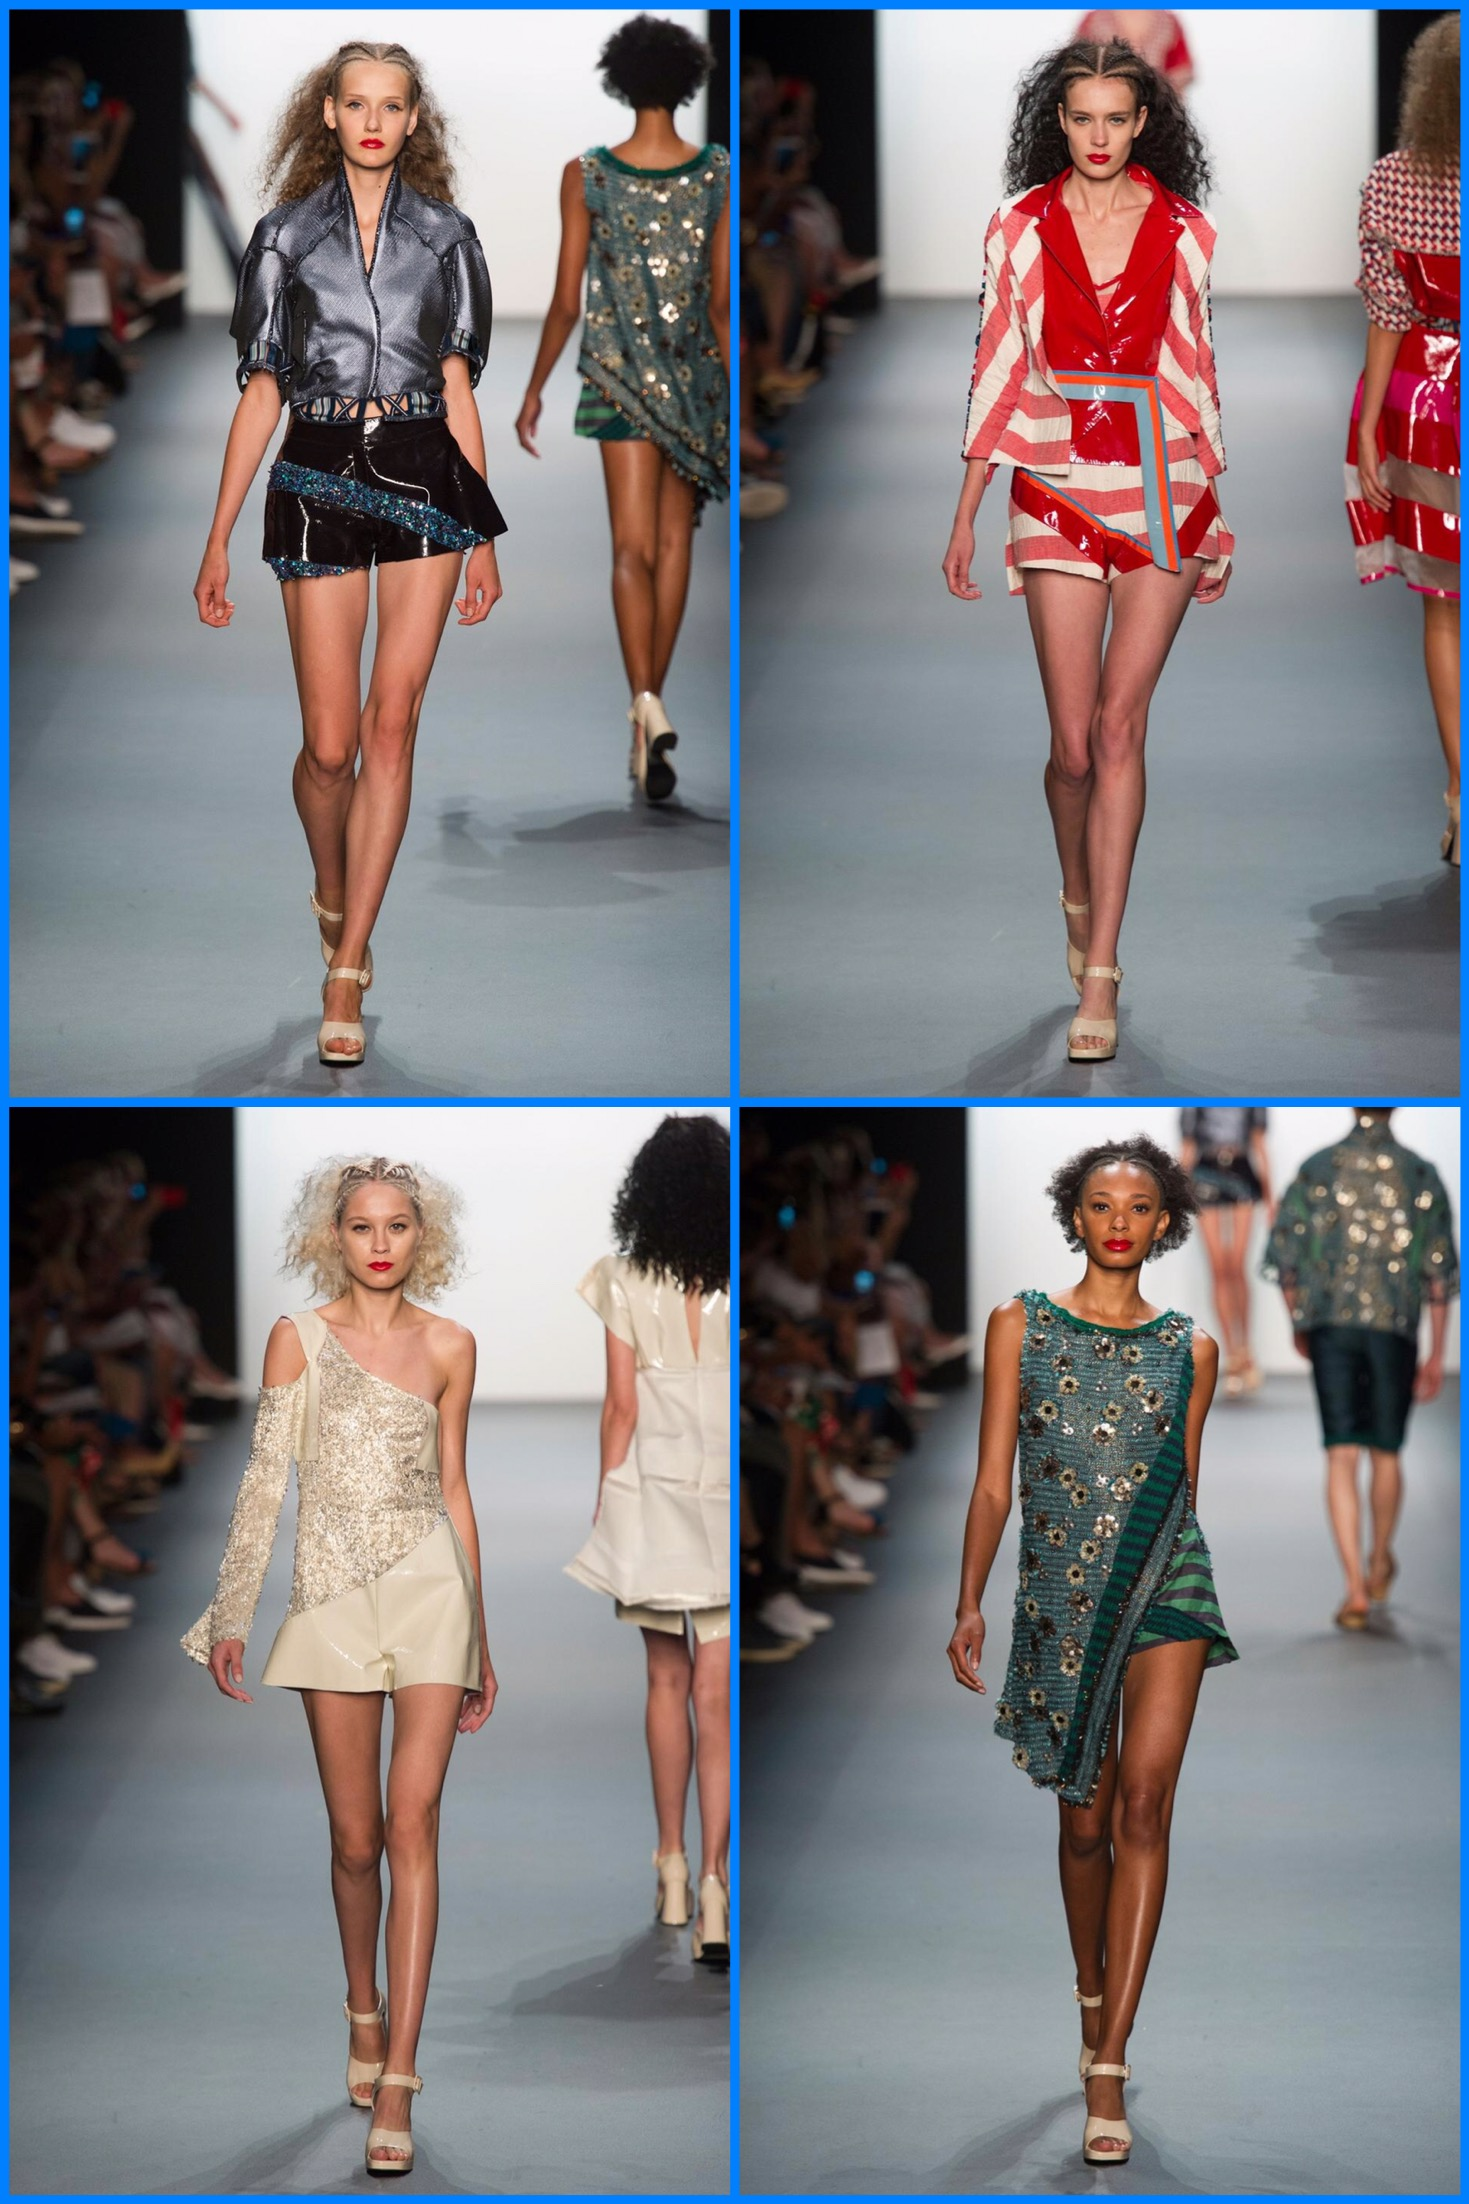 new-york-fashion-week-pret-a-porter-spring-summer-2017-style-son-jung-wan